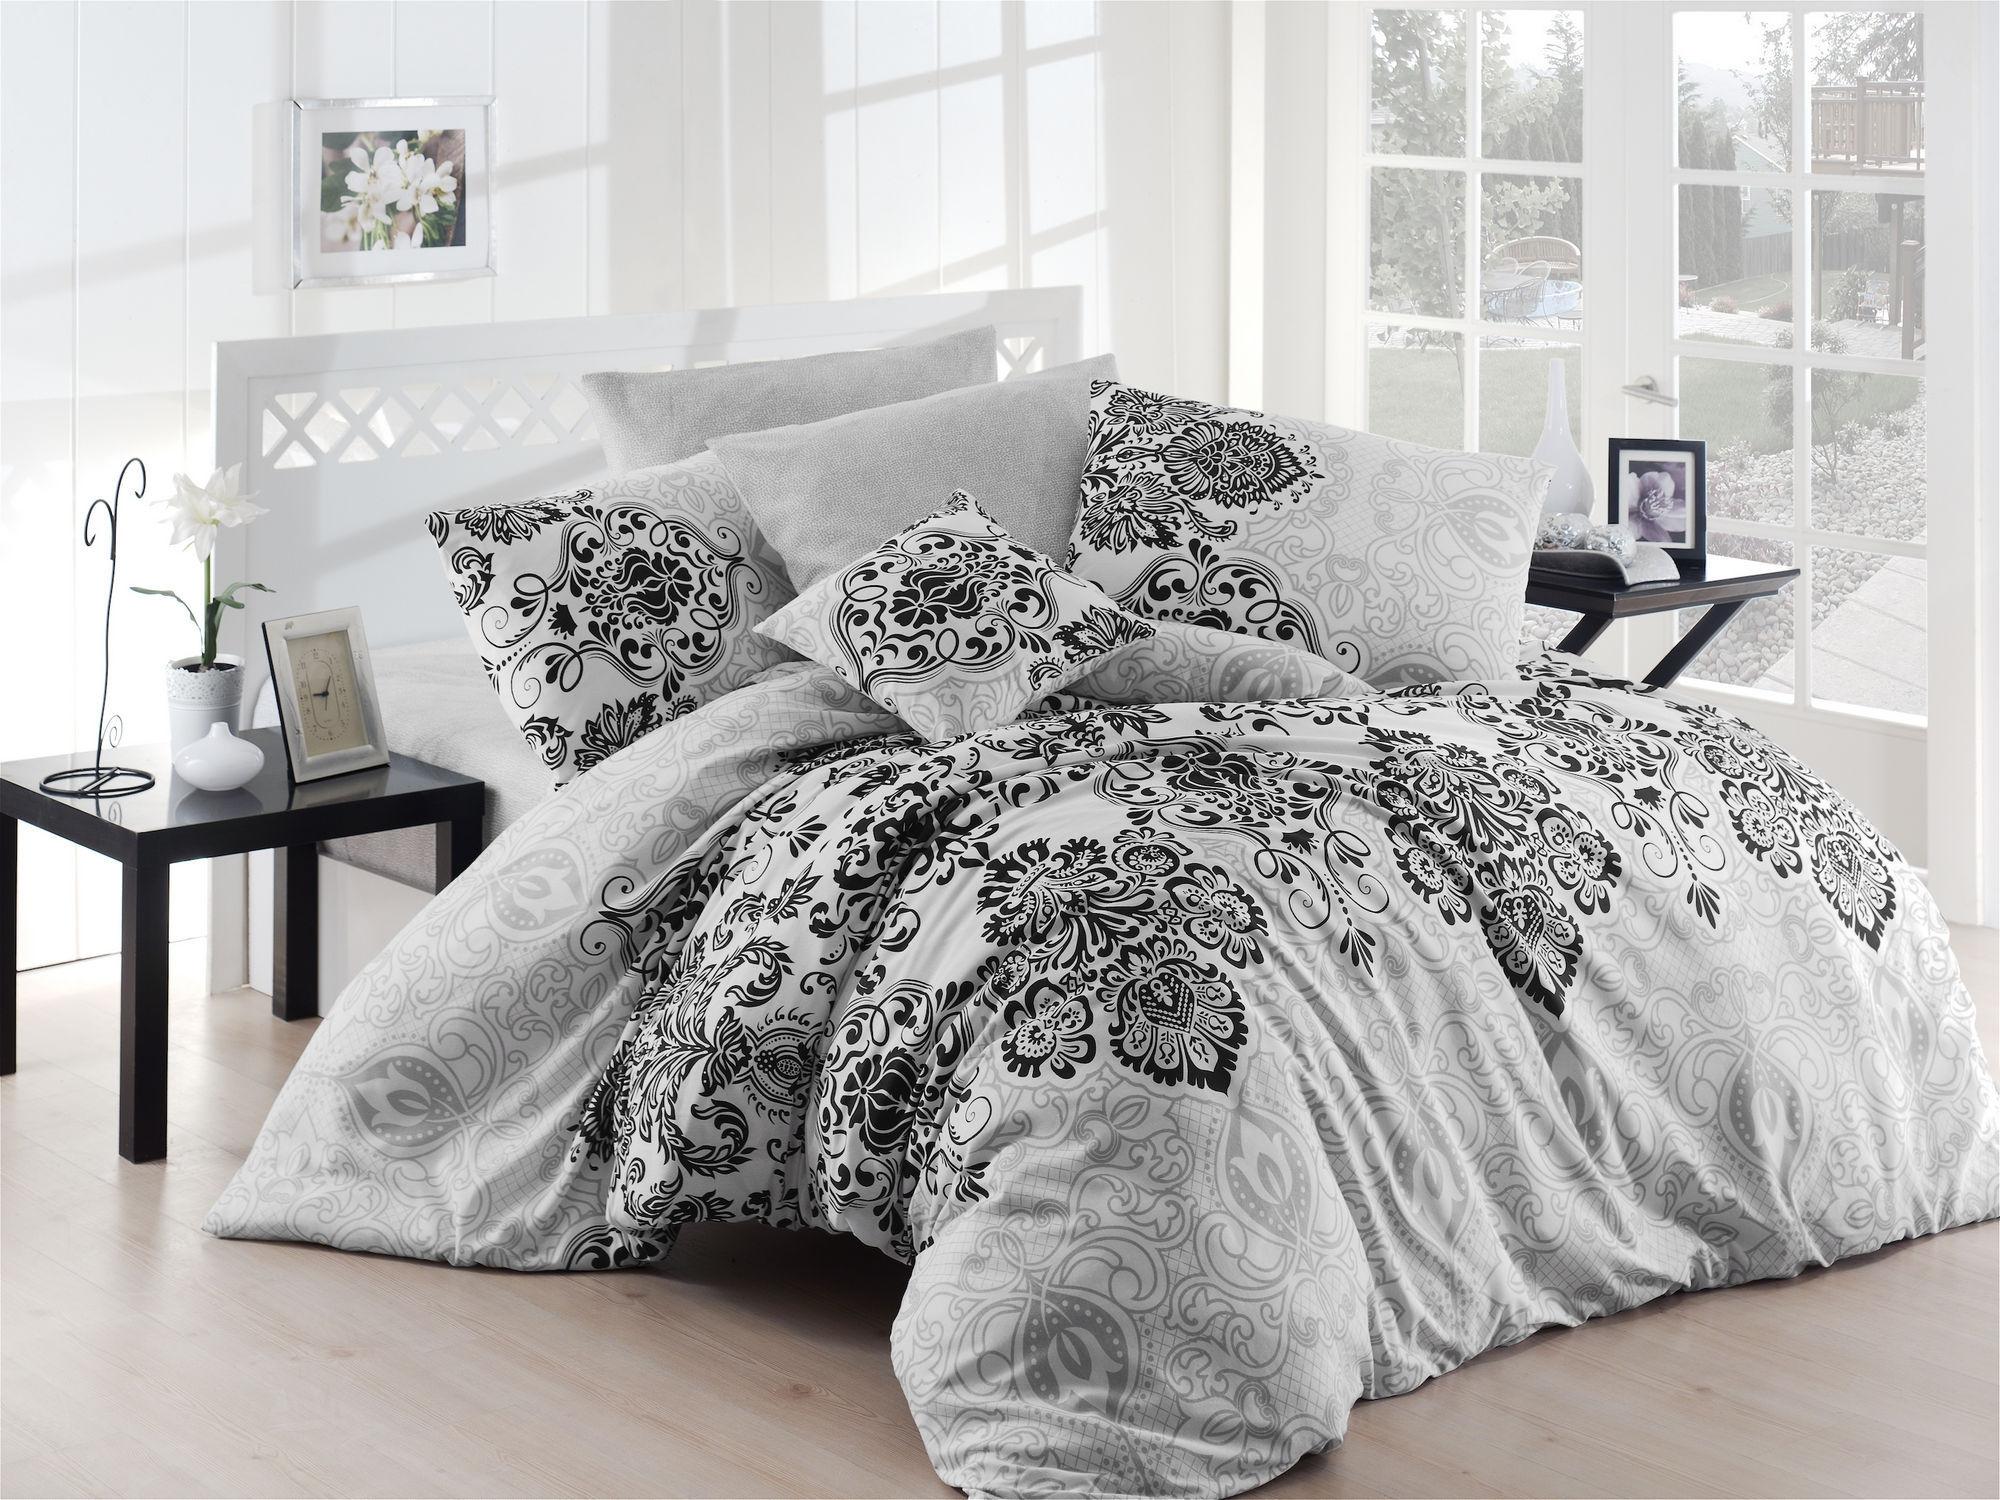 Lenjerie de pat Luxury Gri / Negru, 200 x 220 cm imagine